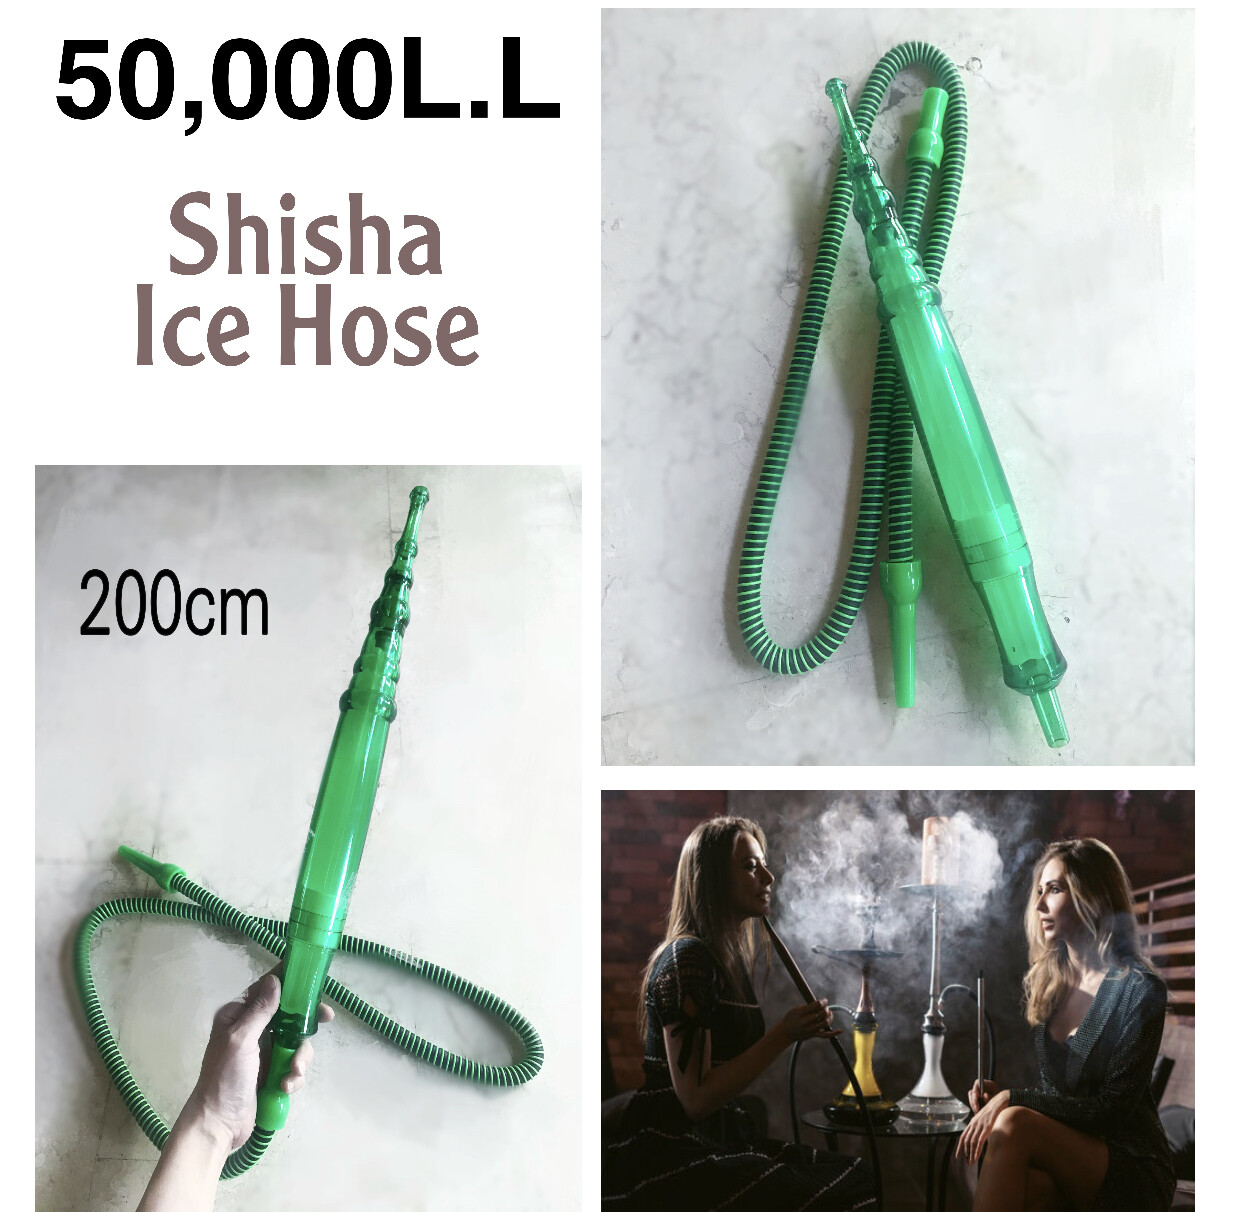 Shisha Ice Hose